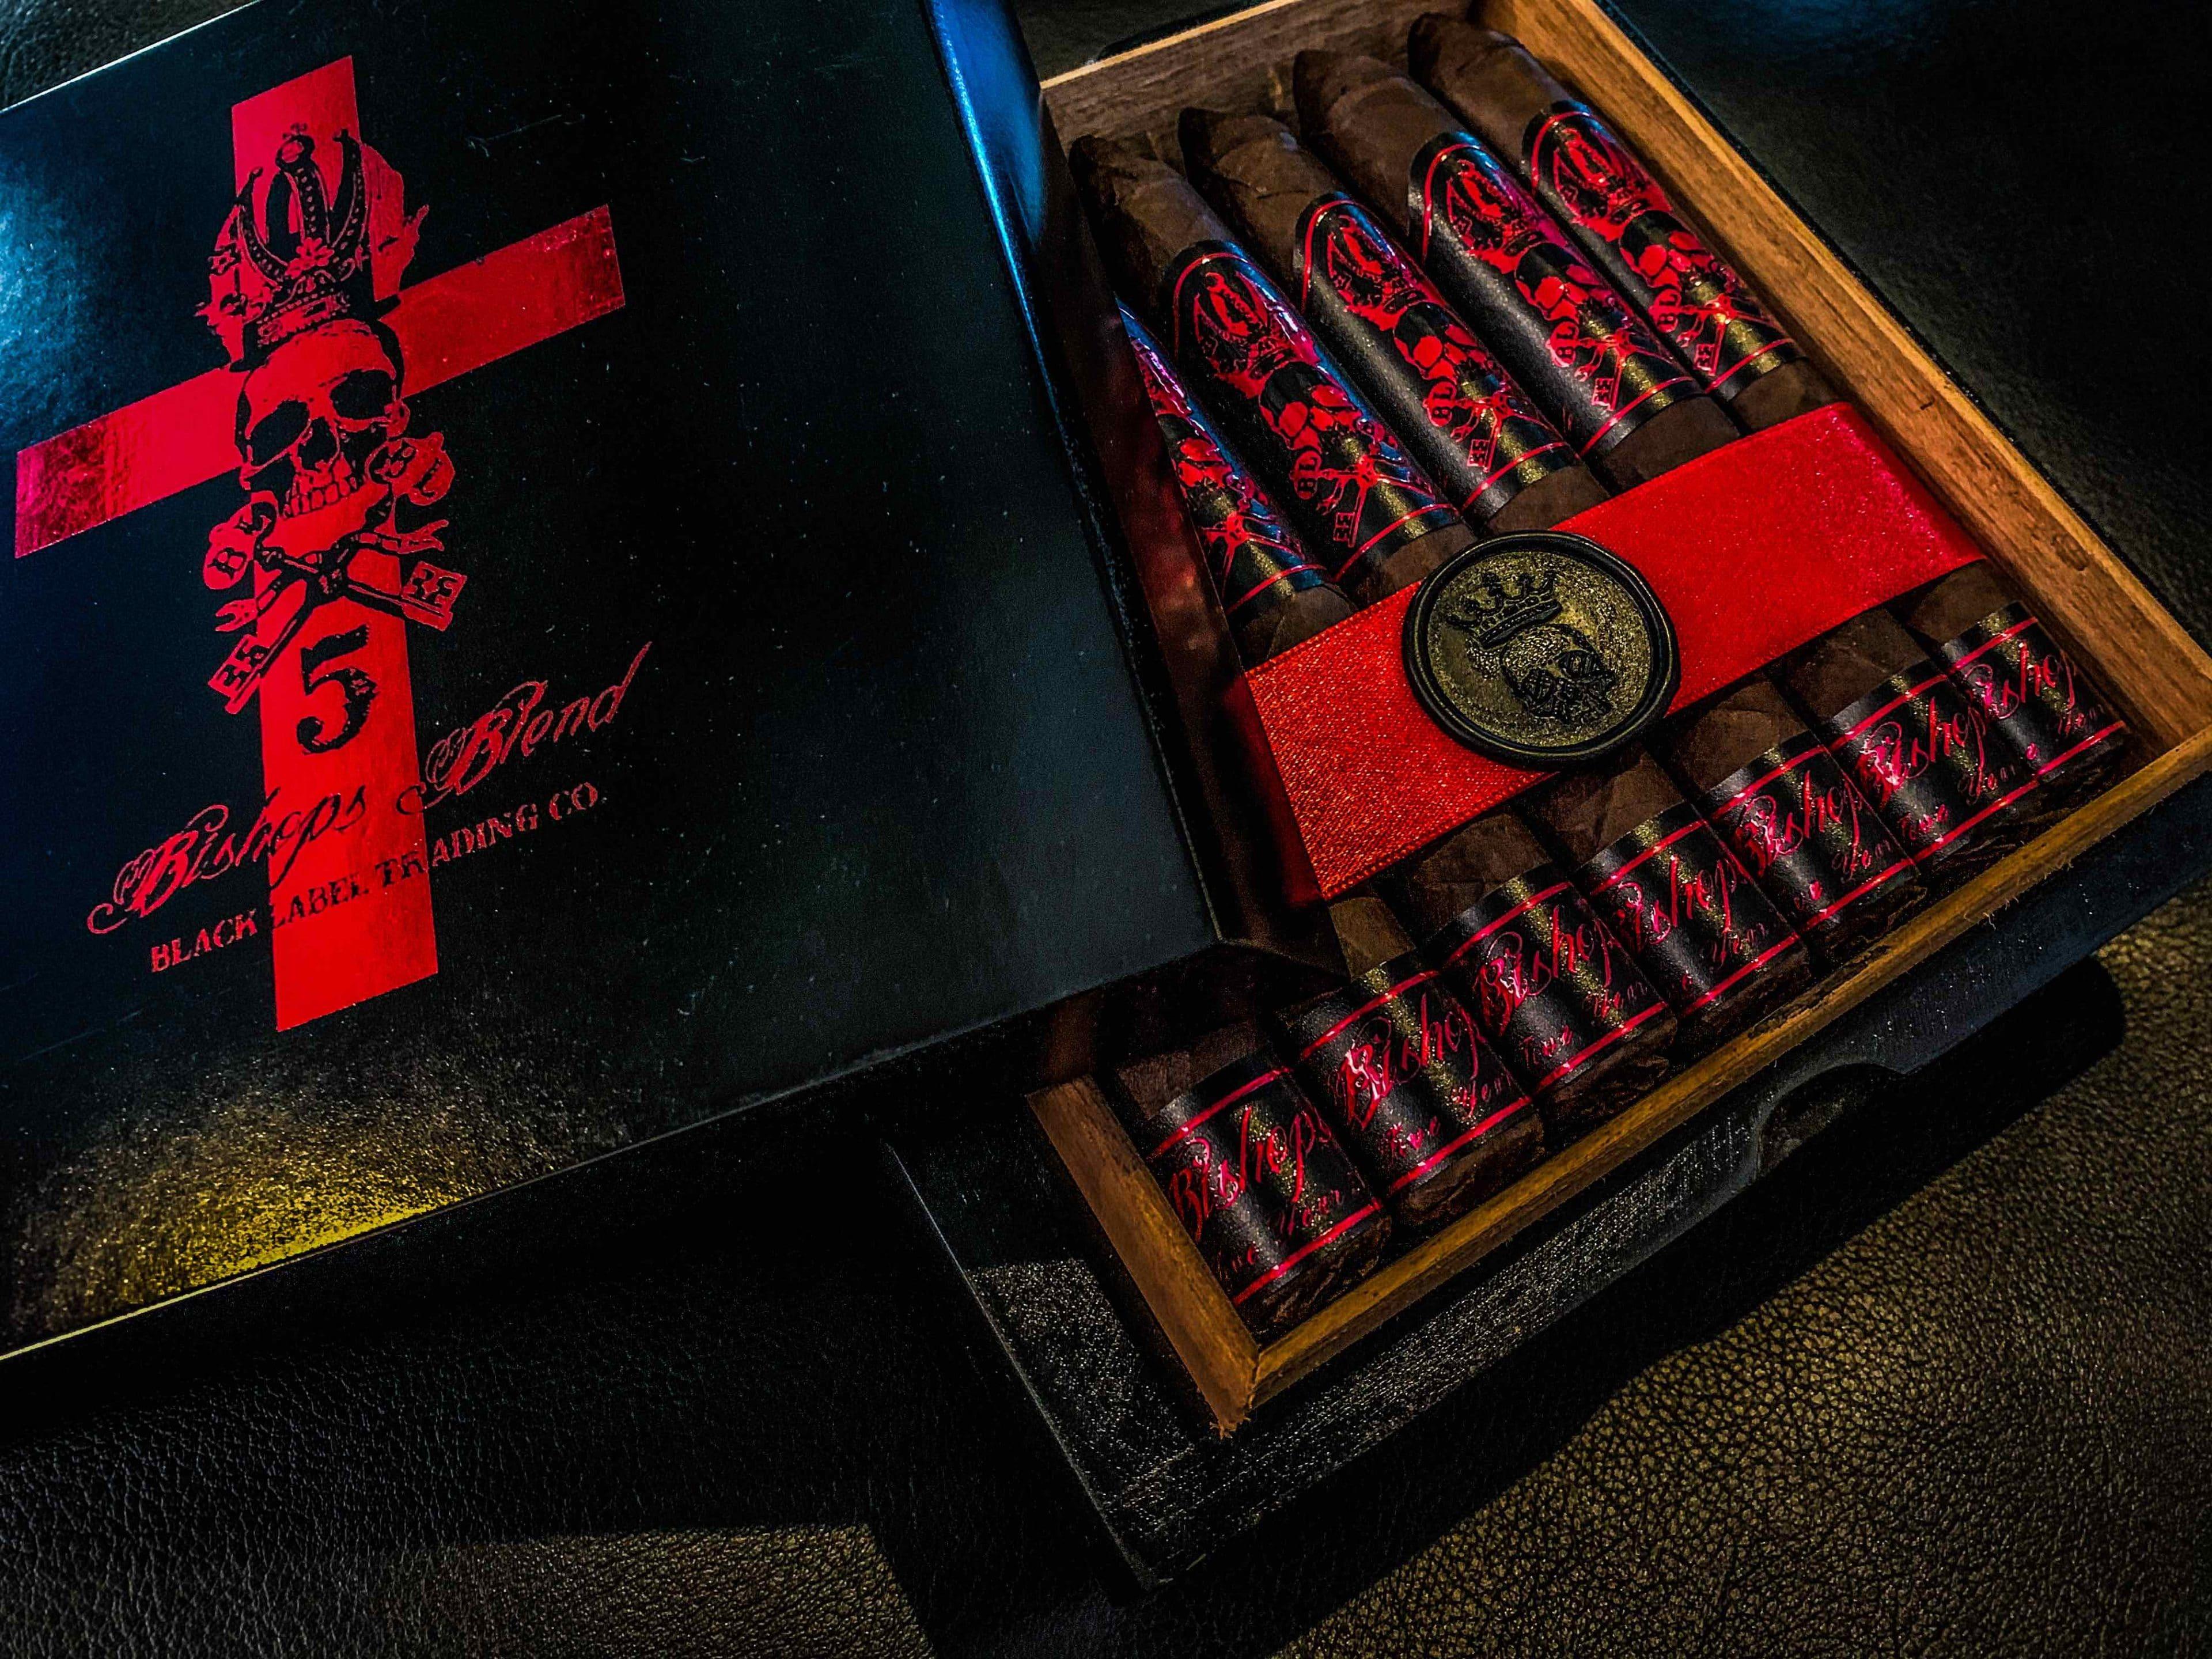 Cigar News: Black Label Trading Company Ships Bishops Blend 5 Year Anniversary